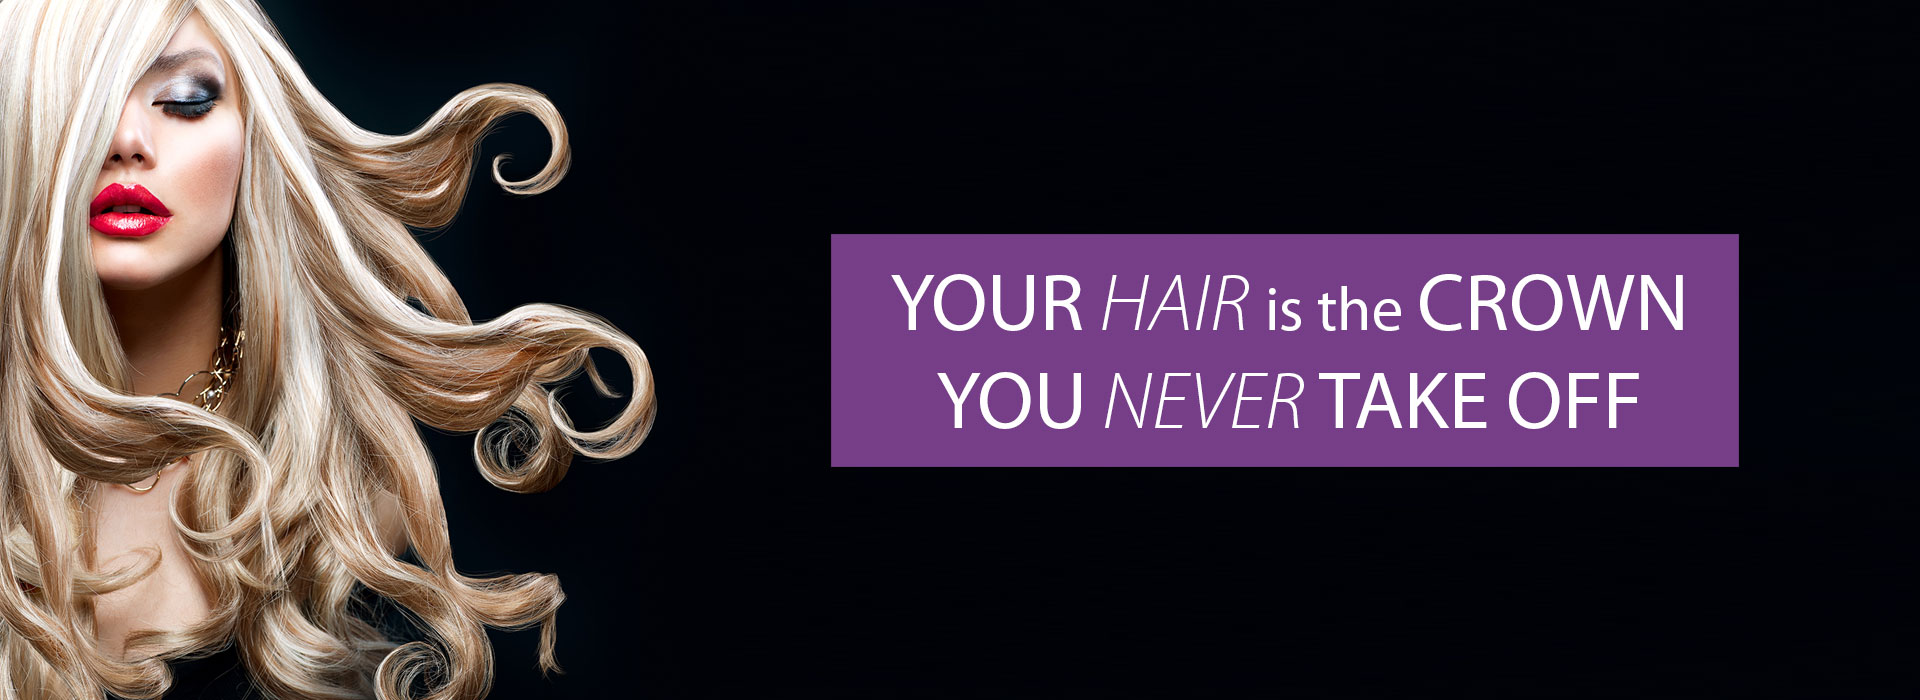 prp-natural-hair-restoration-women-prp-treatment-lake-norman-aesthetics-concierge-med-spa-laser-center-mooresville-nc-28117